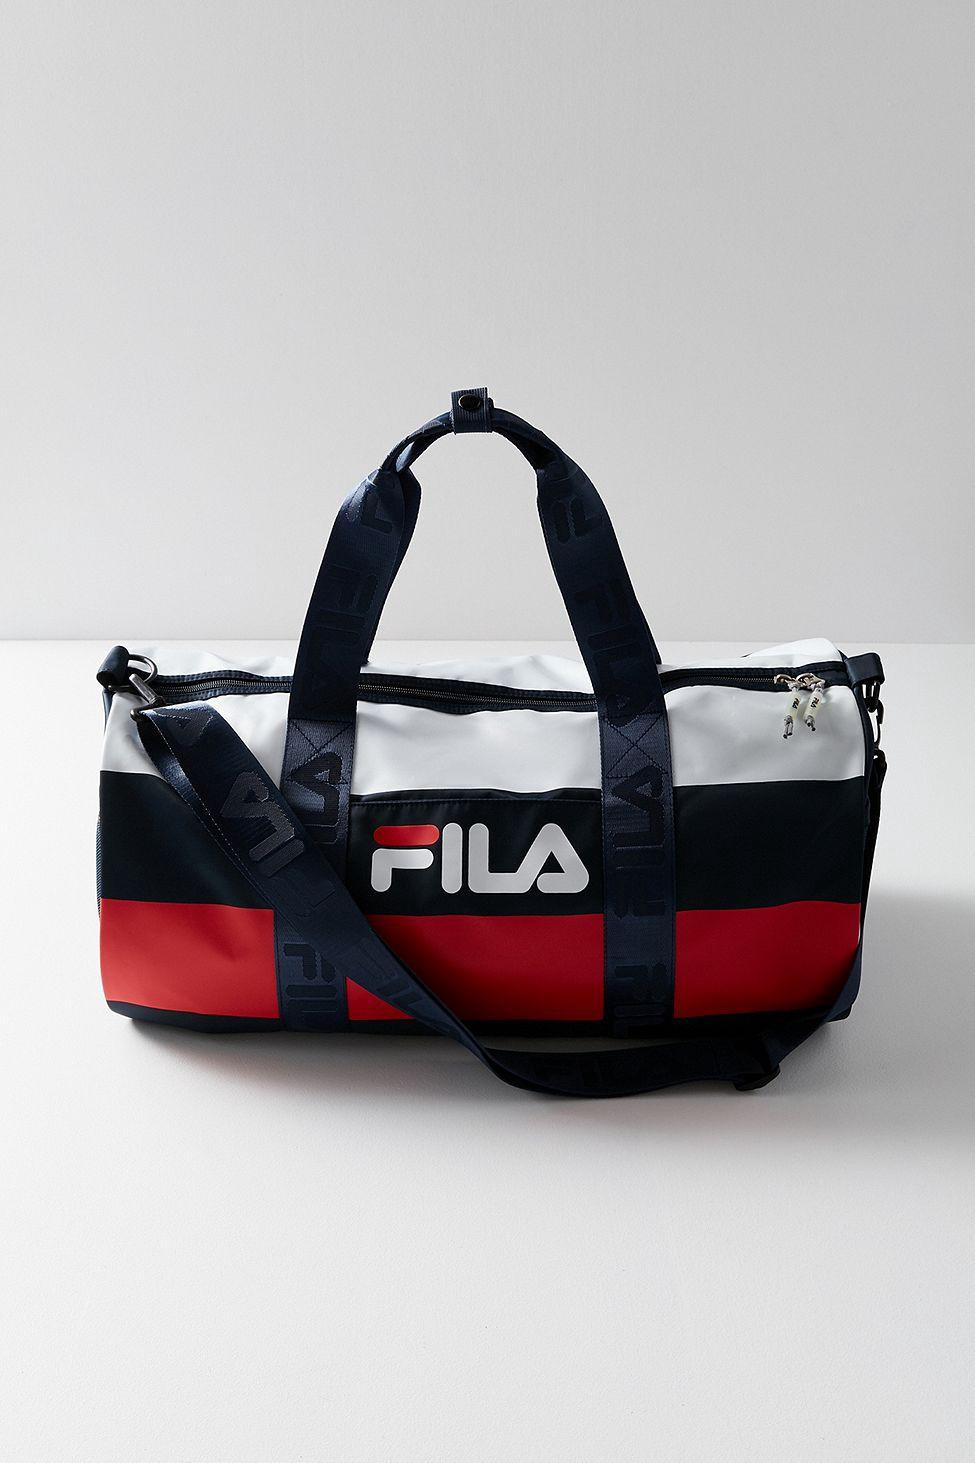 5a280bc08cbd5e Urban Outfitters Fila Major Stripe Duffle Bag - Navy One Size ...